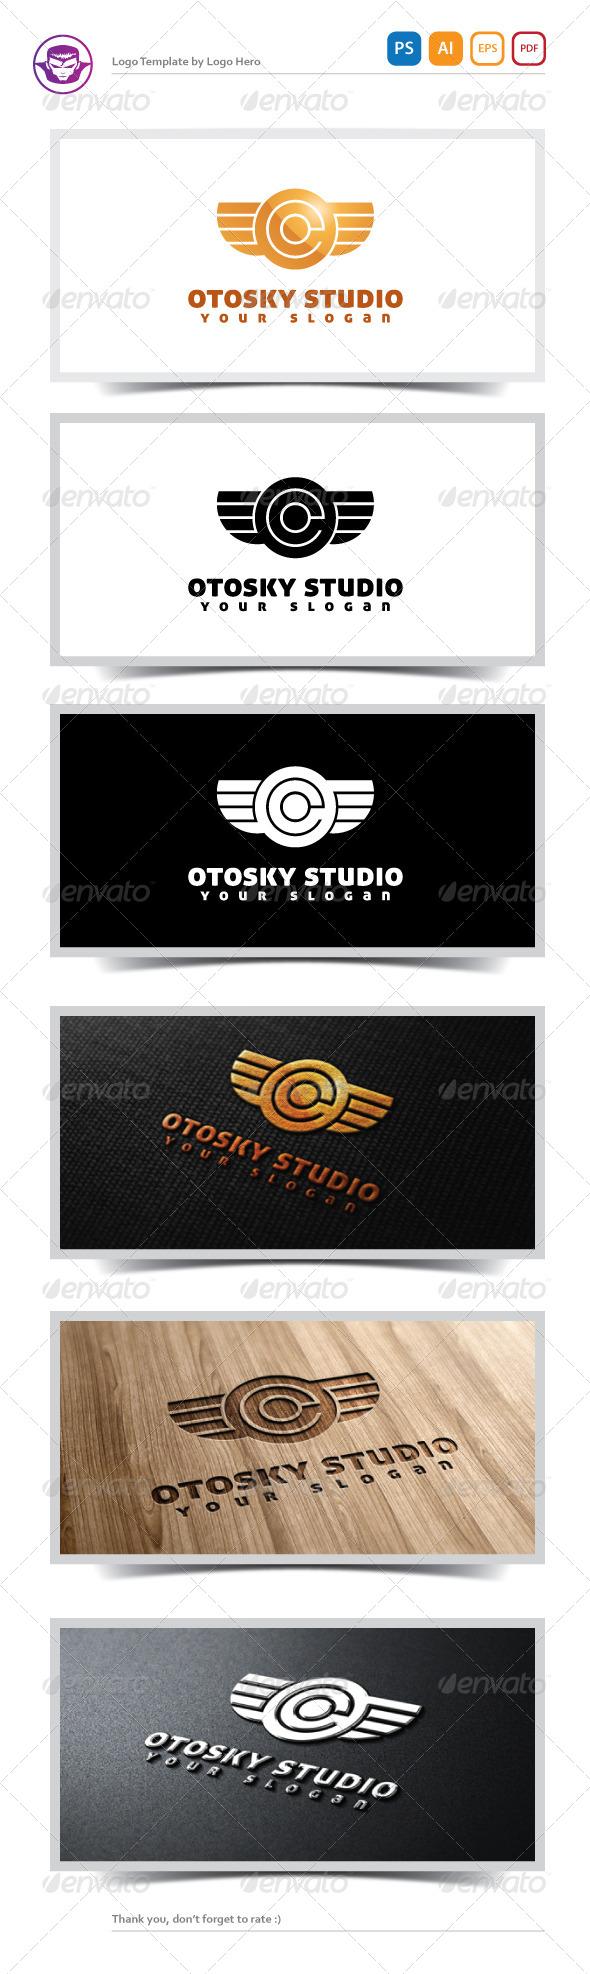 Otosky Studio Logo Template